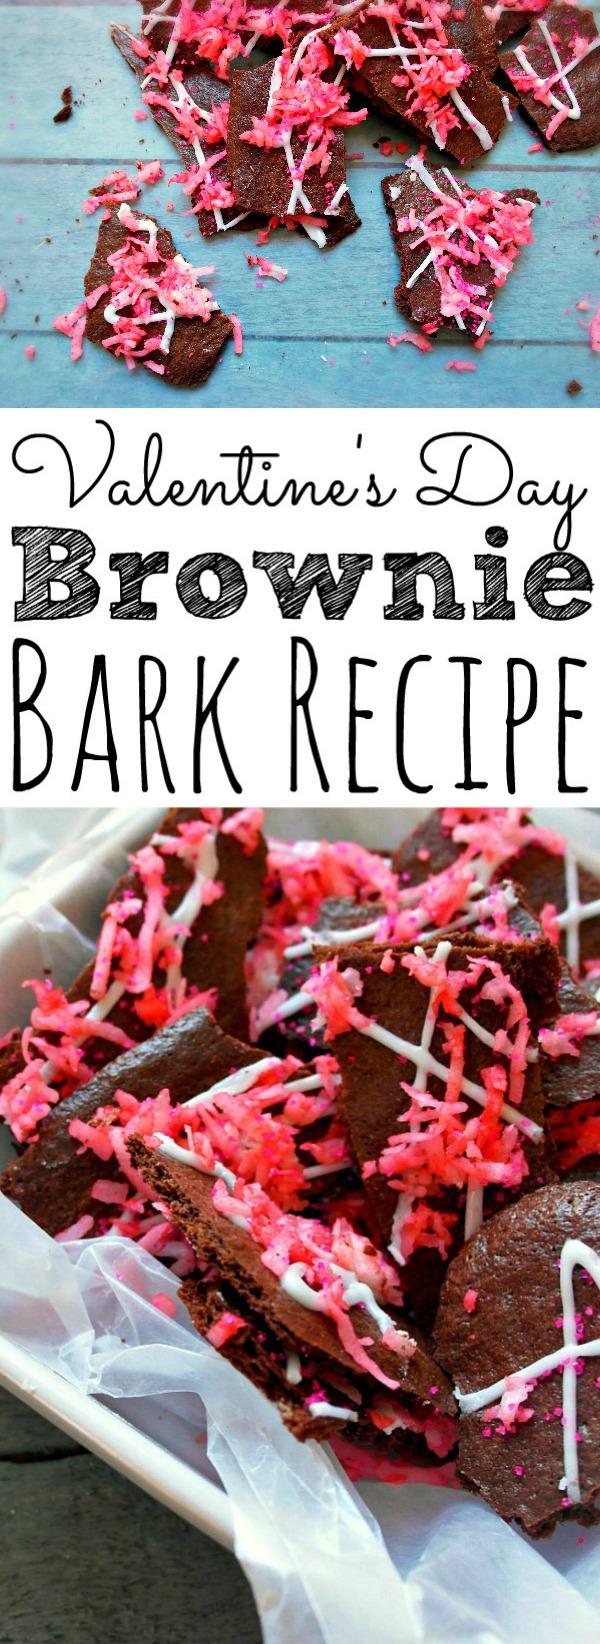 Valentine's Day Brownie Bark Recipe - simplytodaylife.com